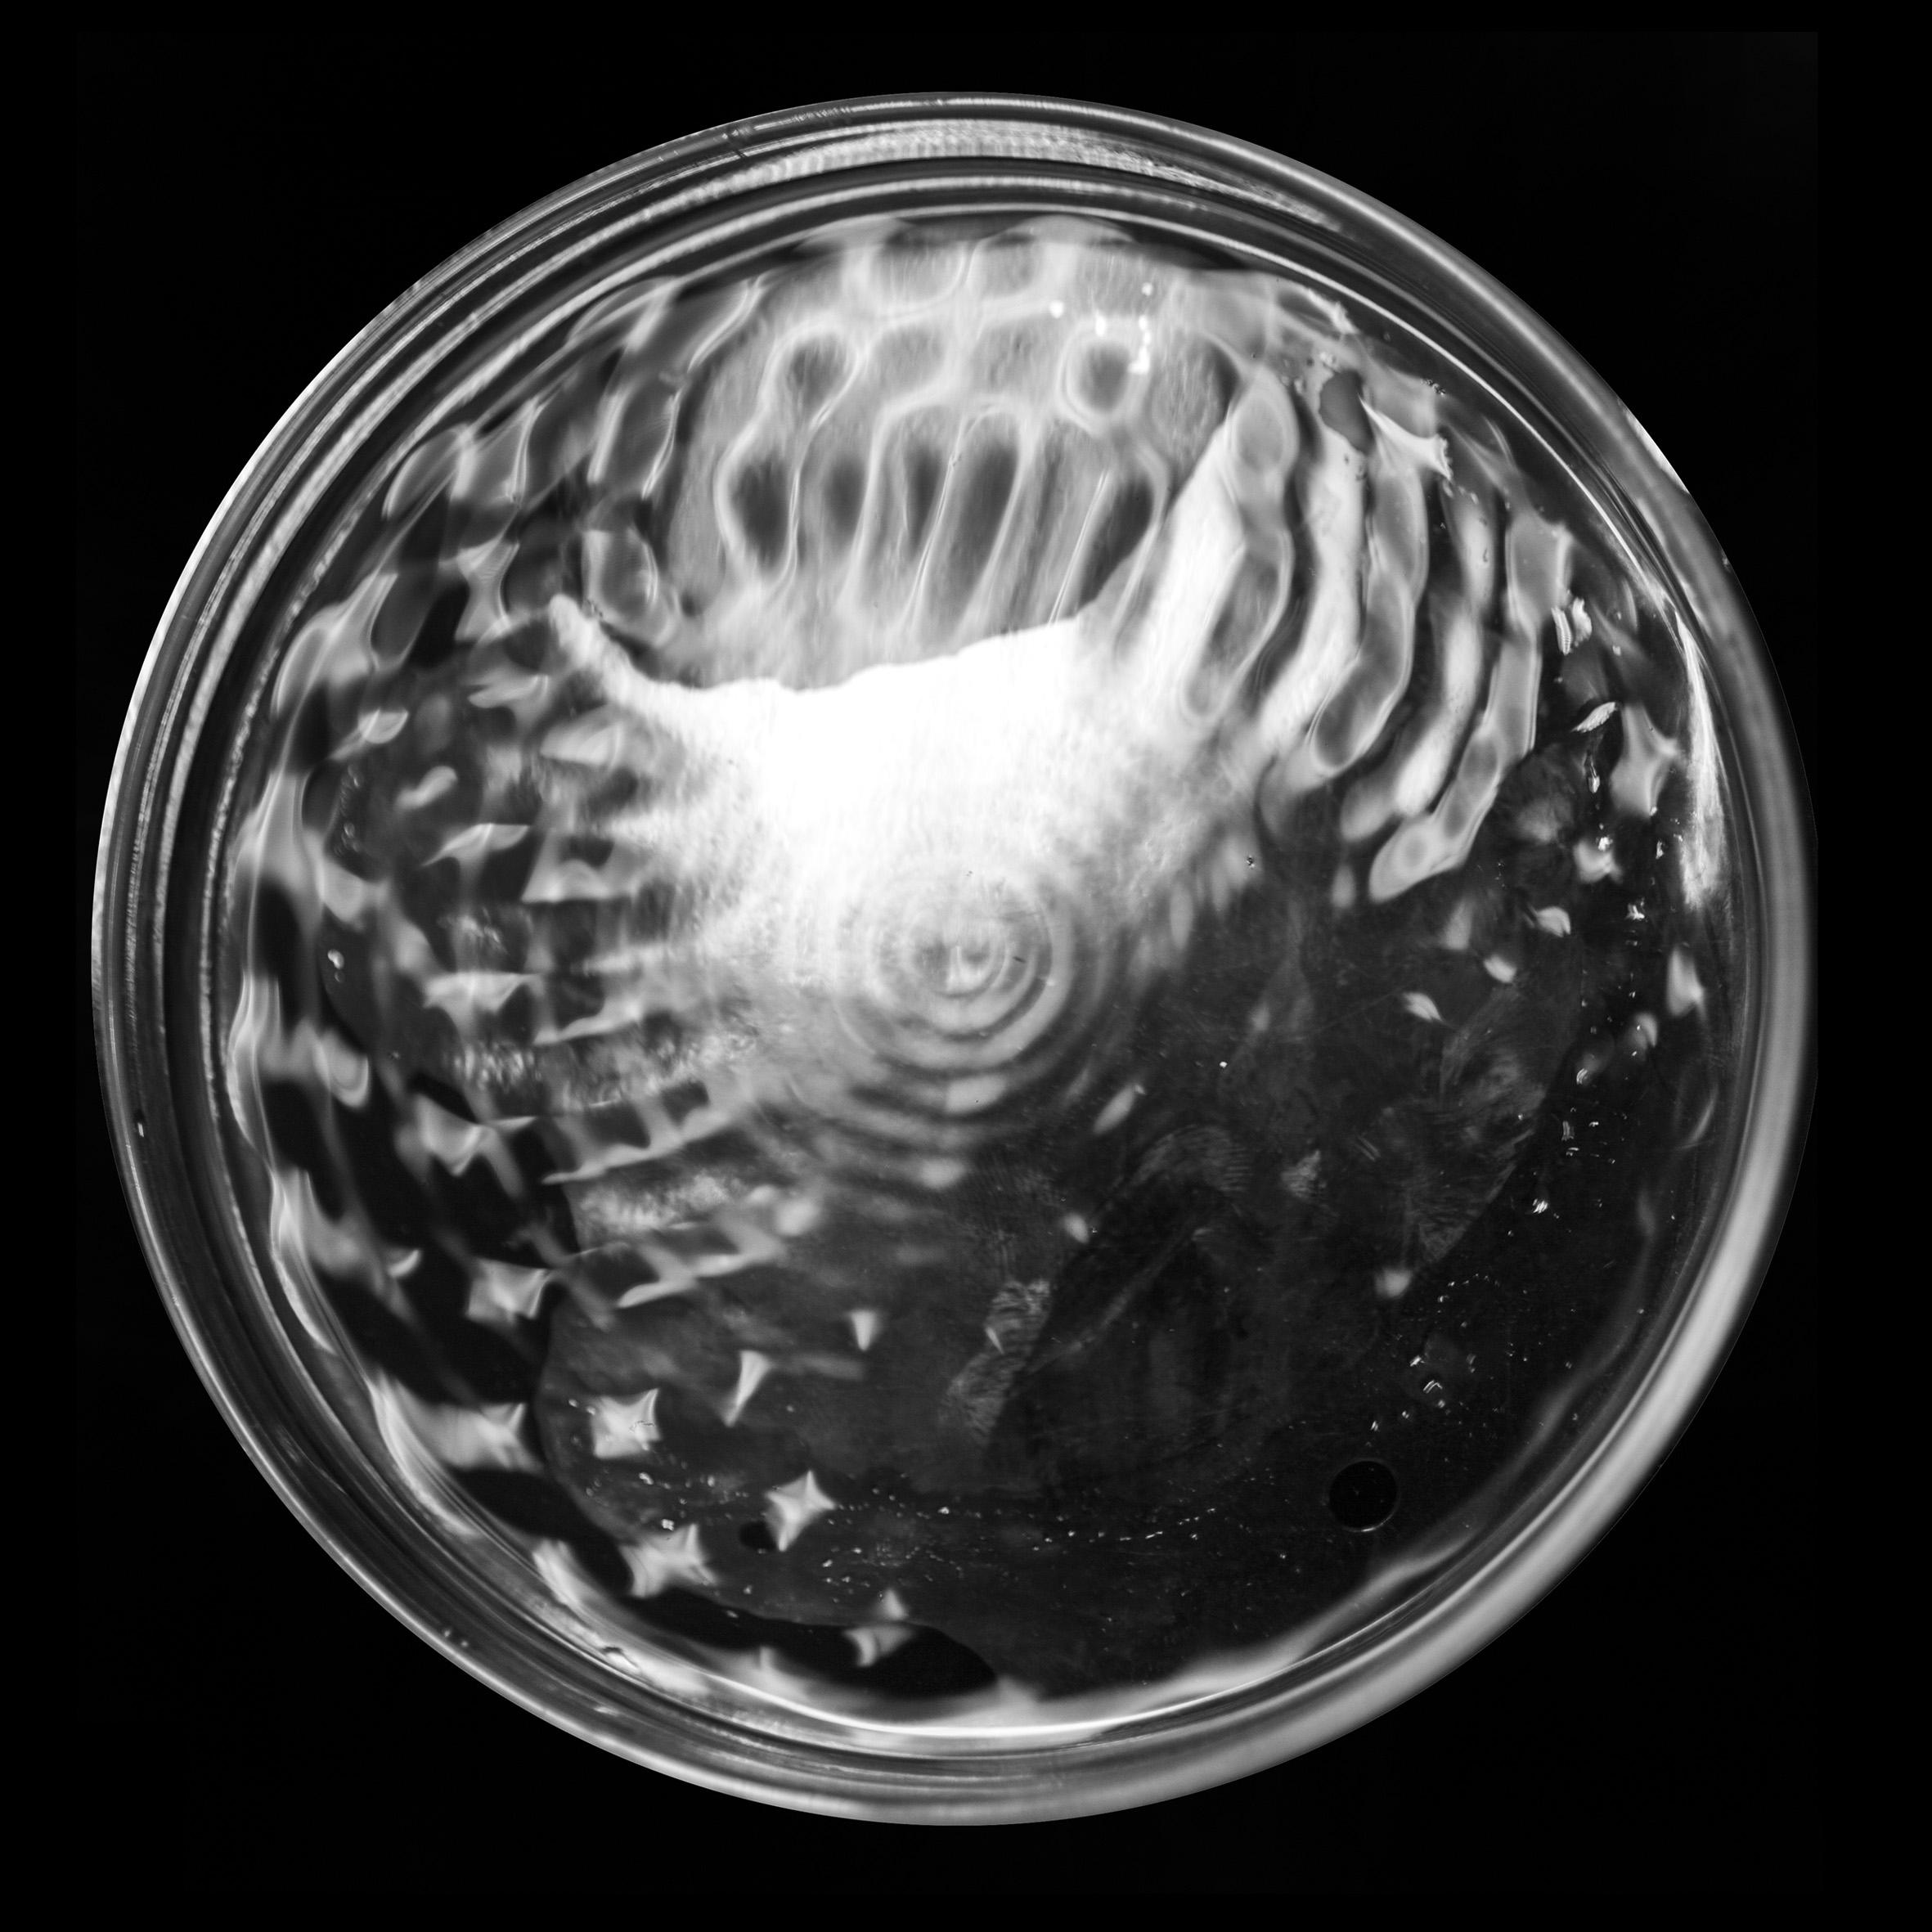 Hz-24. 50Hz- Tonoscoop-patroon01